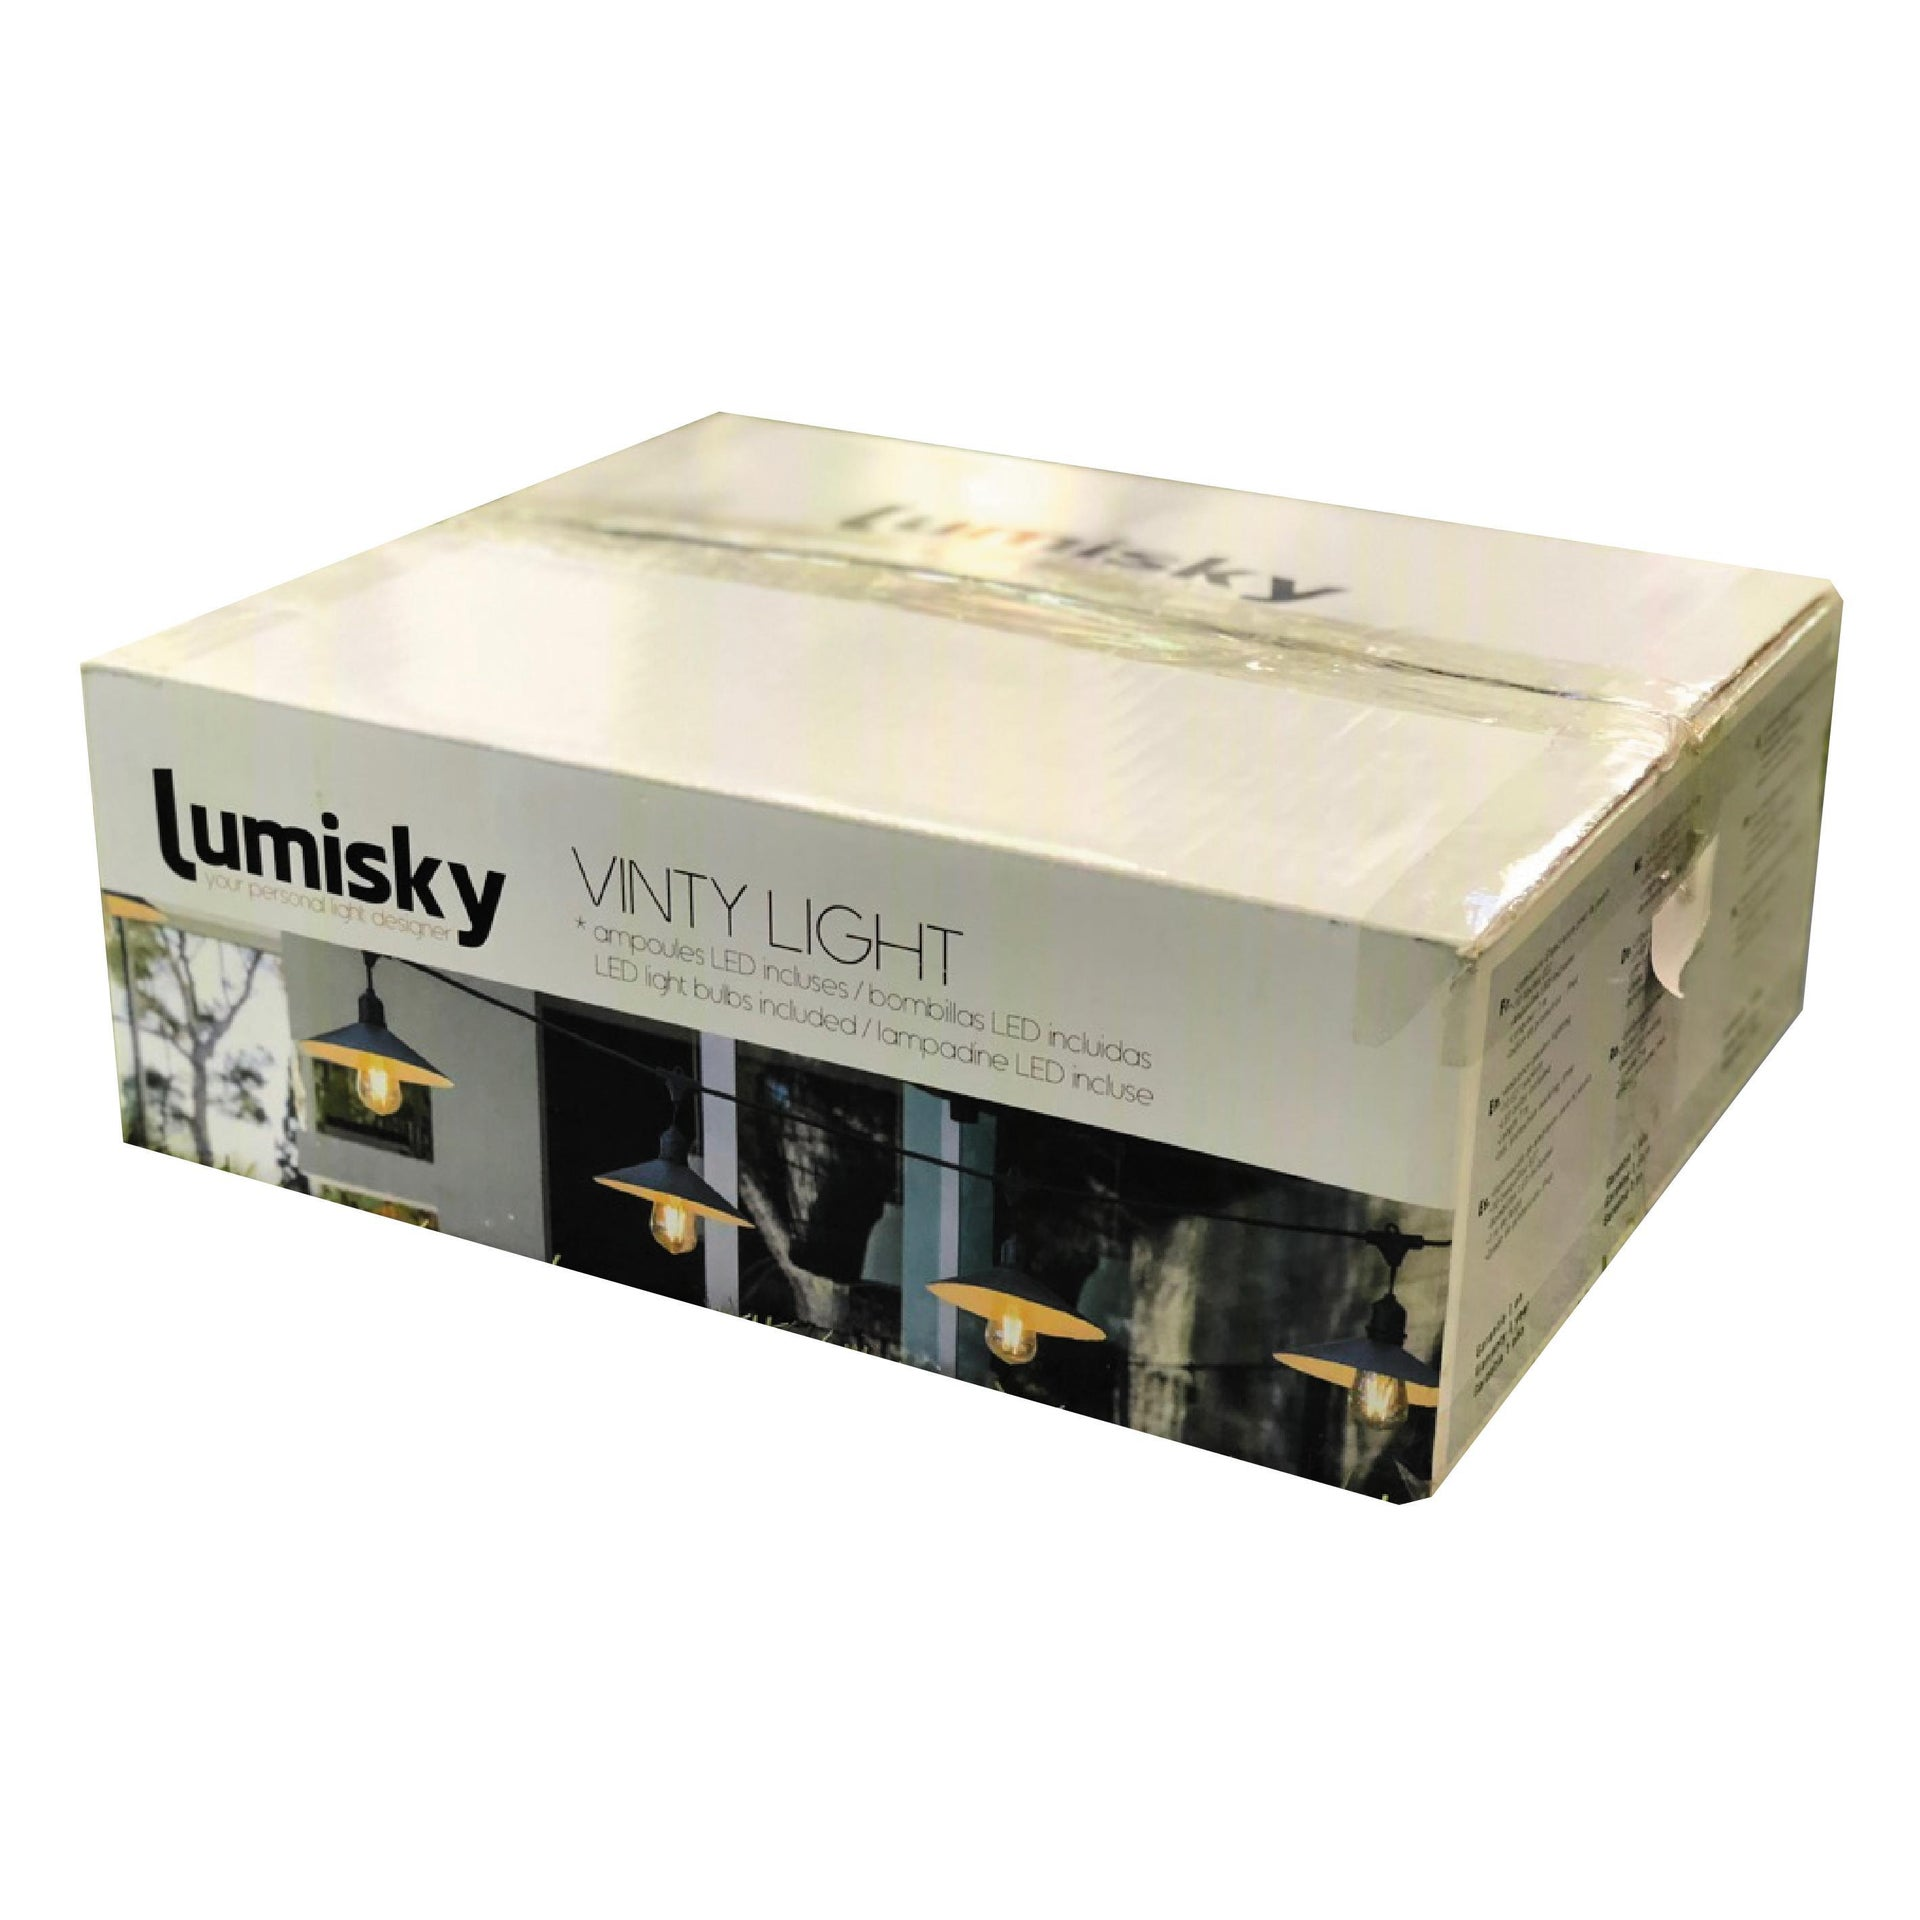 Ghirlanda VINTY 10 lampadine 7 m IP44 LUMISKY - 8